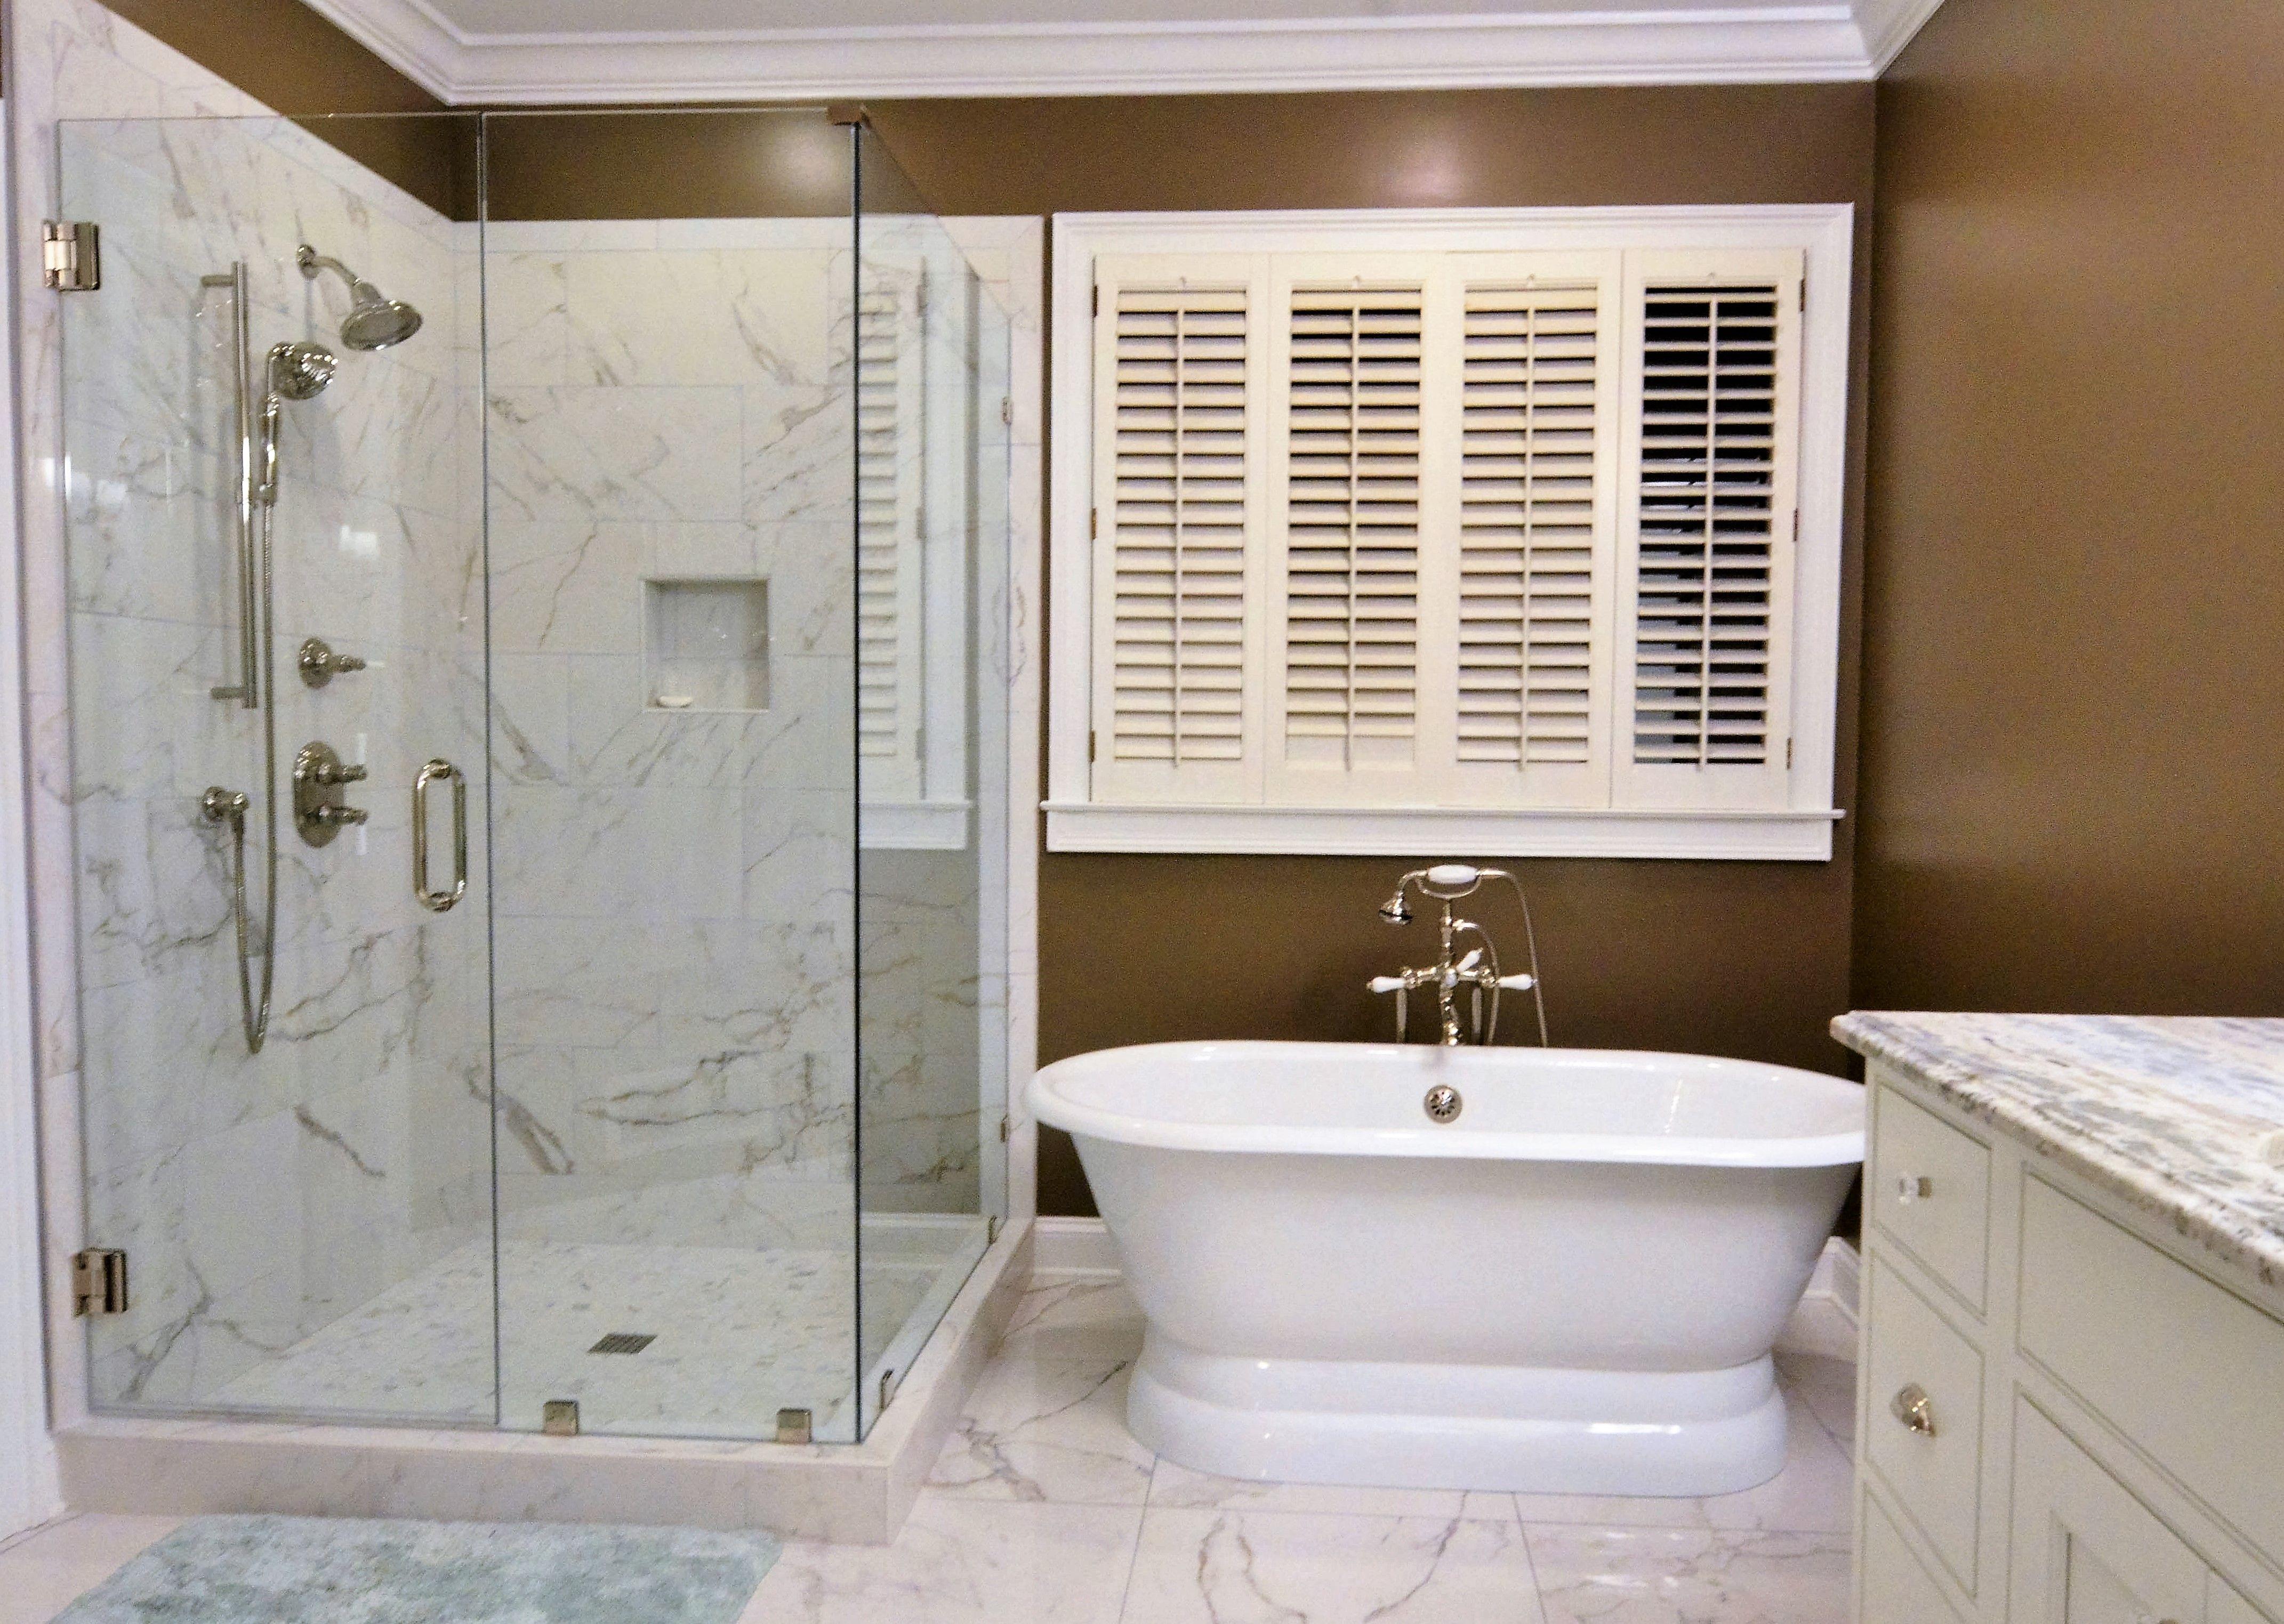 Master Bathroom Renovation By Atlanta General Contractor Penn Carpentry LLC    Freestanding Tub, Frameless Shower